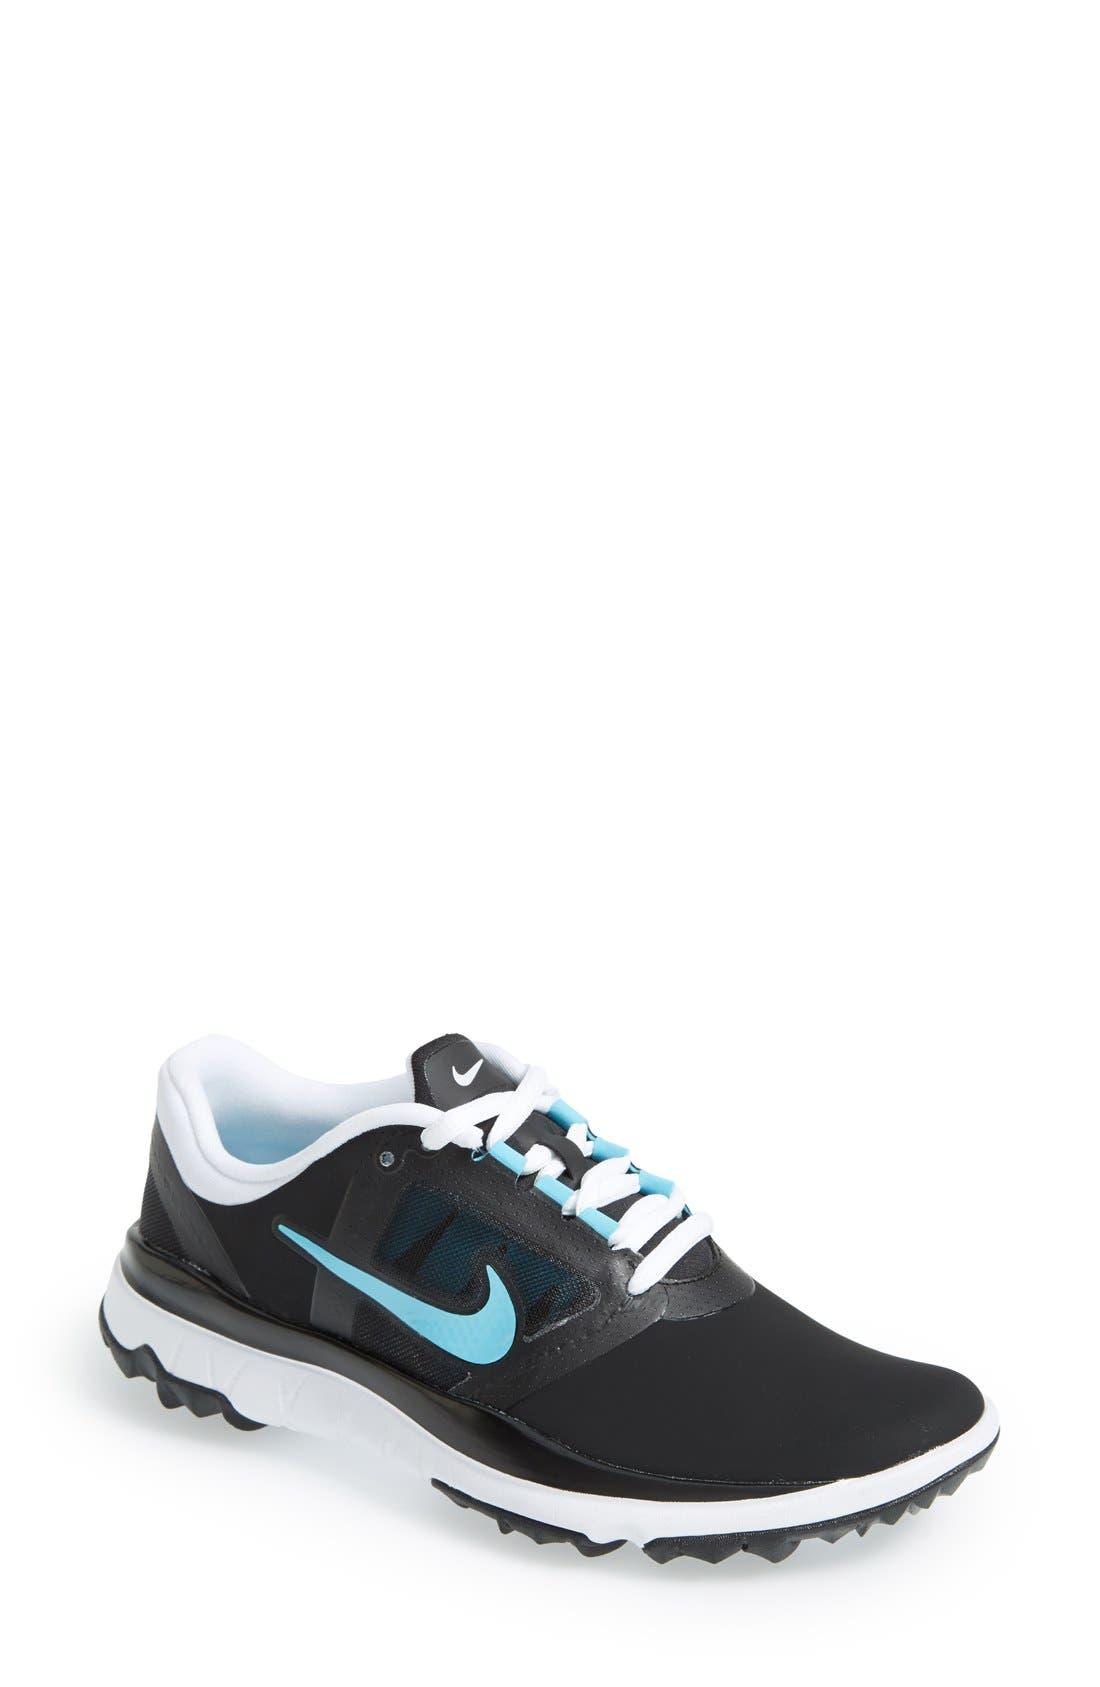 Alternate Image 1 Selected - Nike 'Fi Impact' Waterproof Golf Shoe (Women)